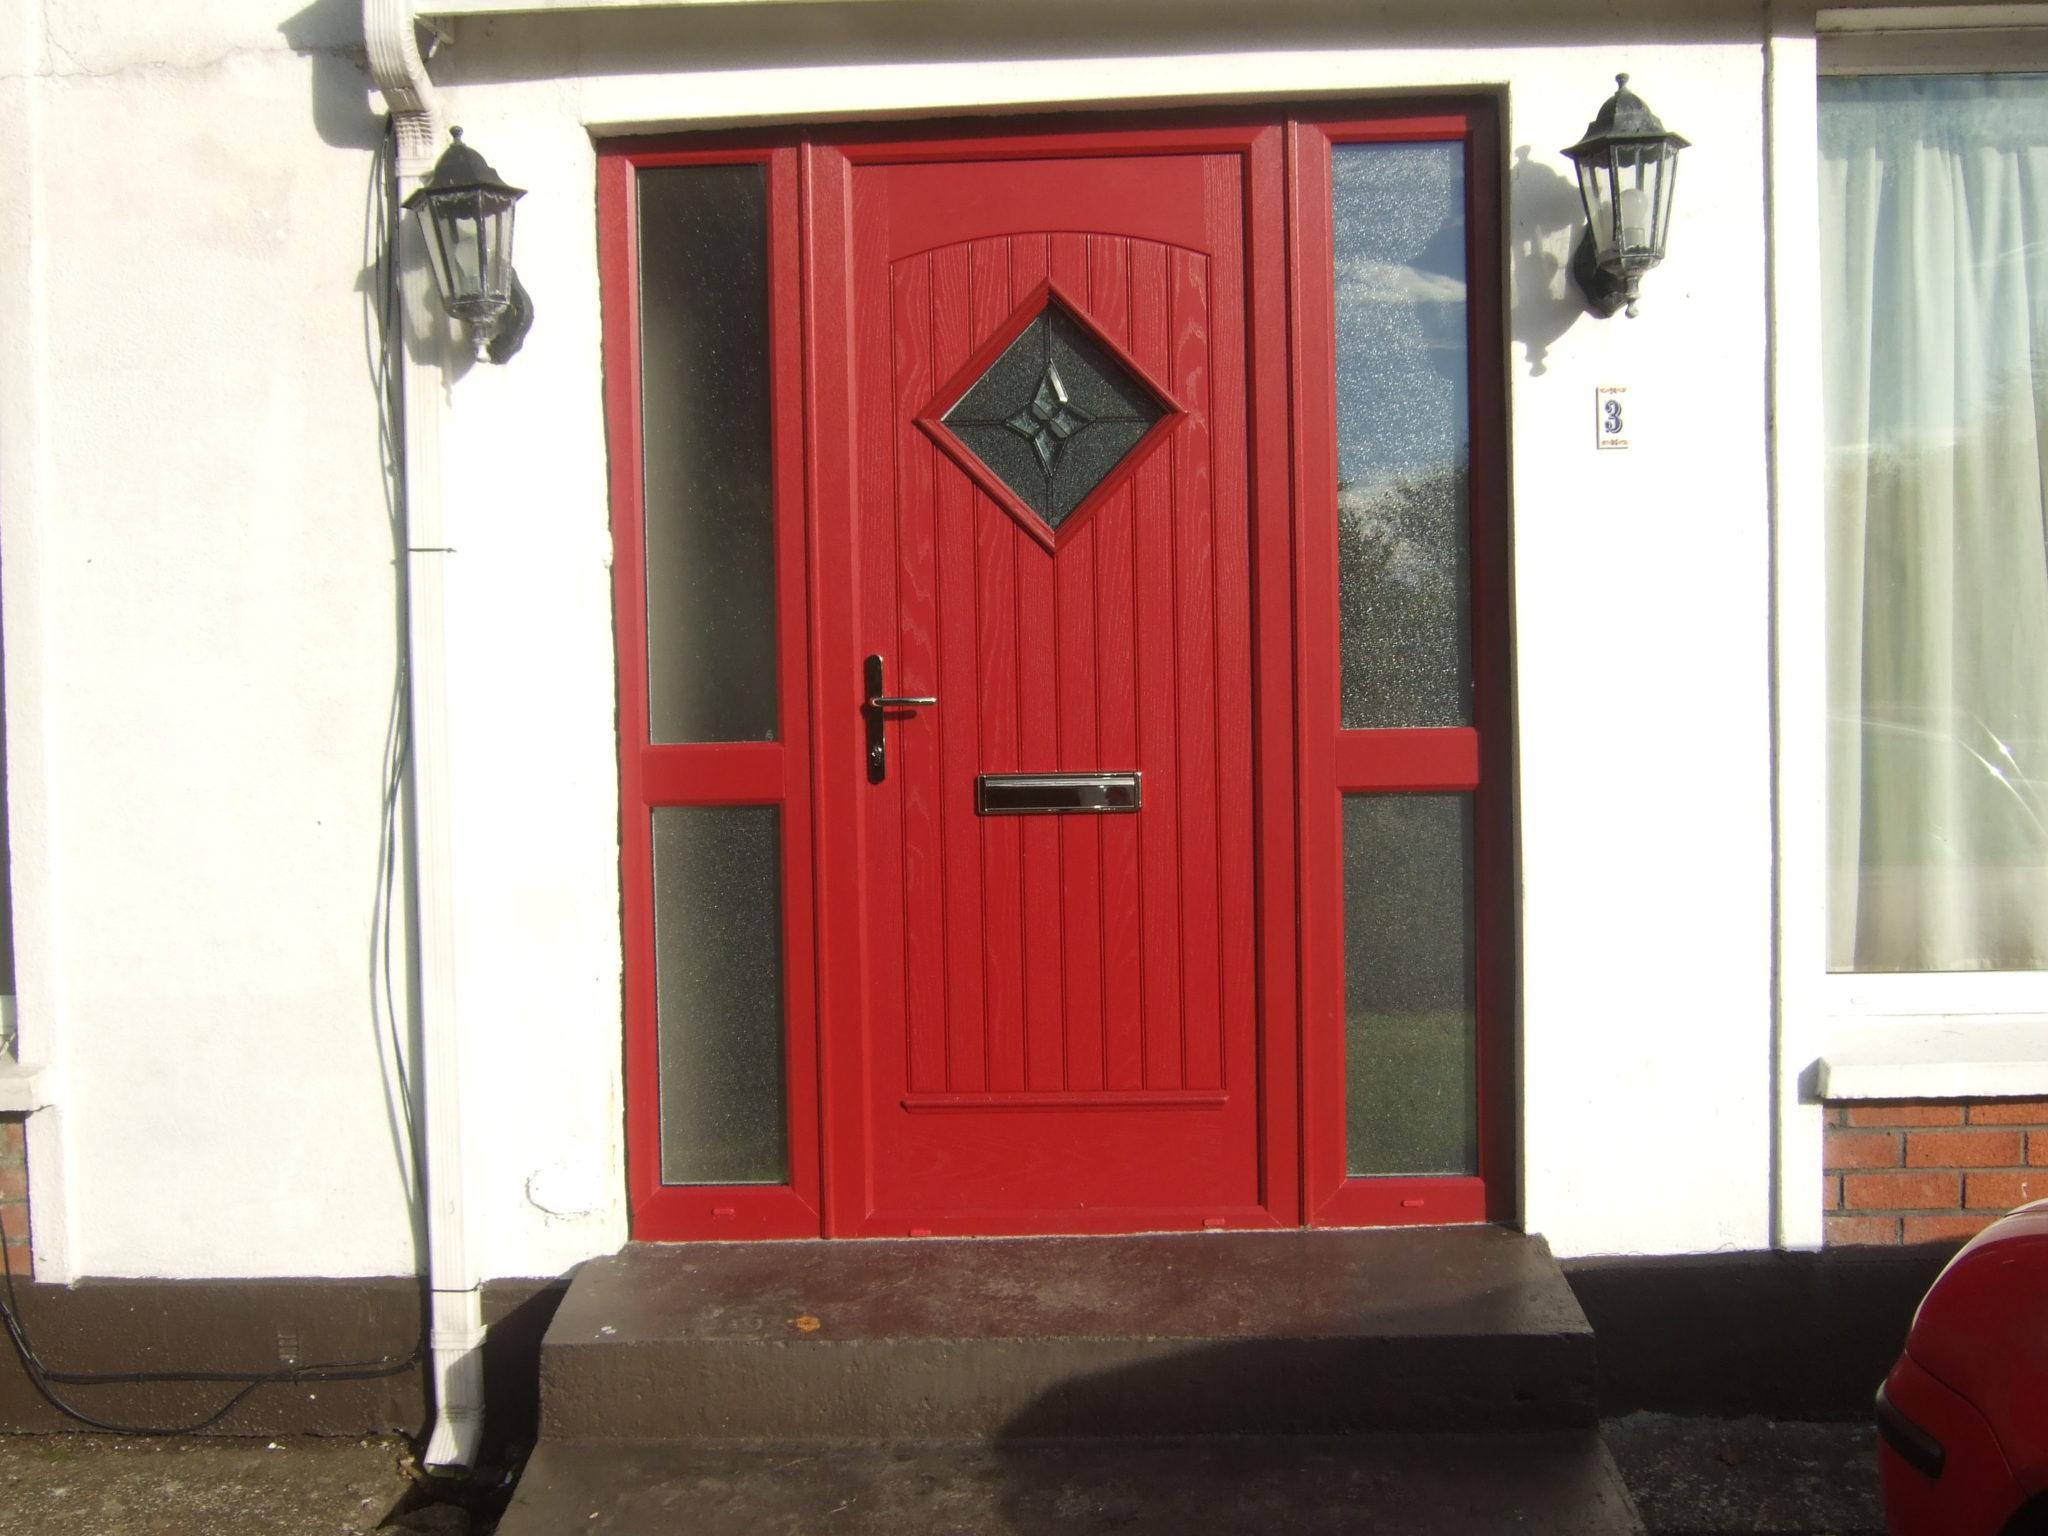 Edinburgh Red Door - My CMS